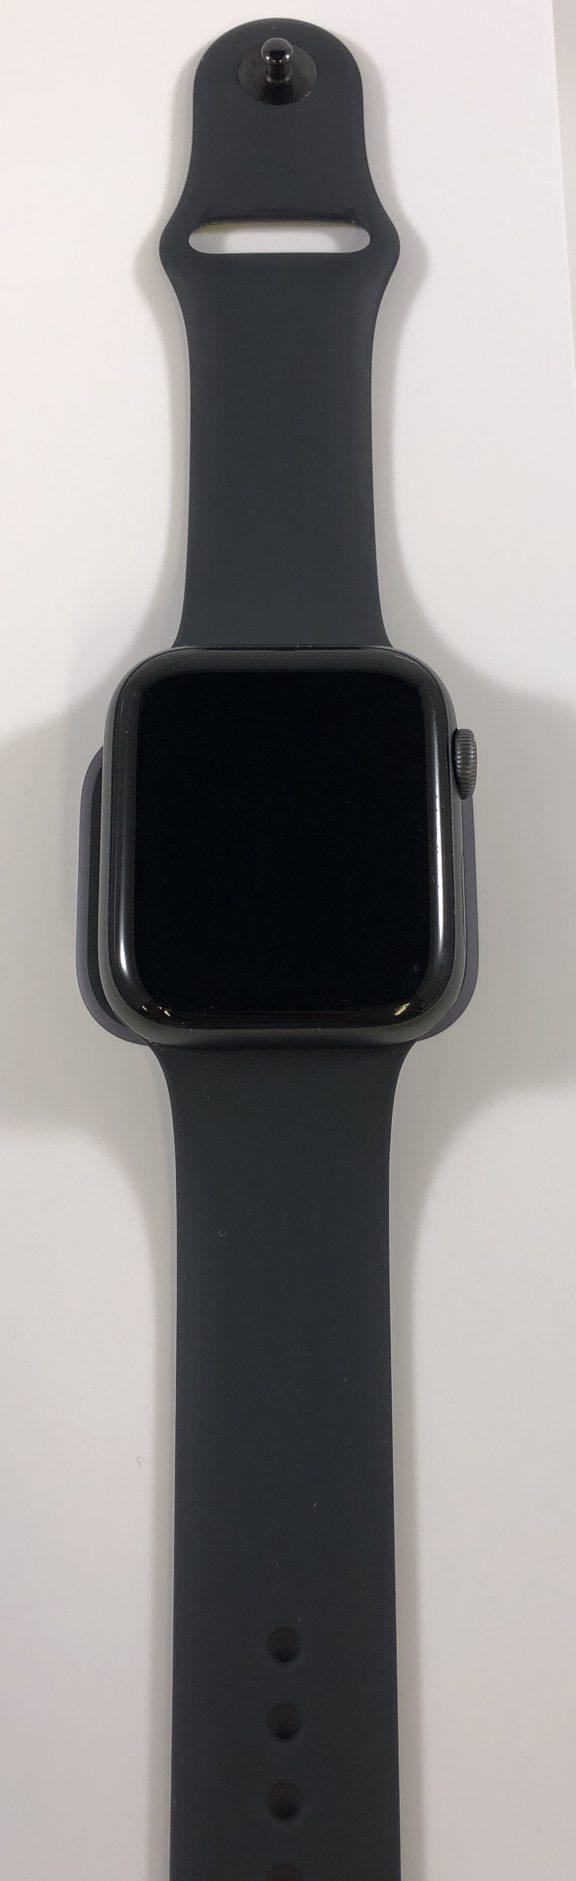 Watch Series 4 Aluminum Cellular (44mm), Space Gray, Black Sport Band, Bild 1